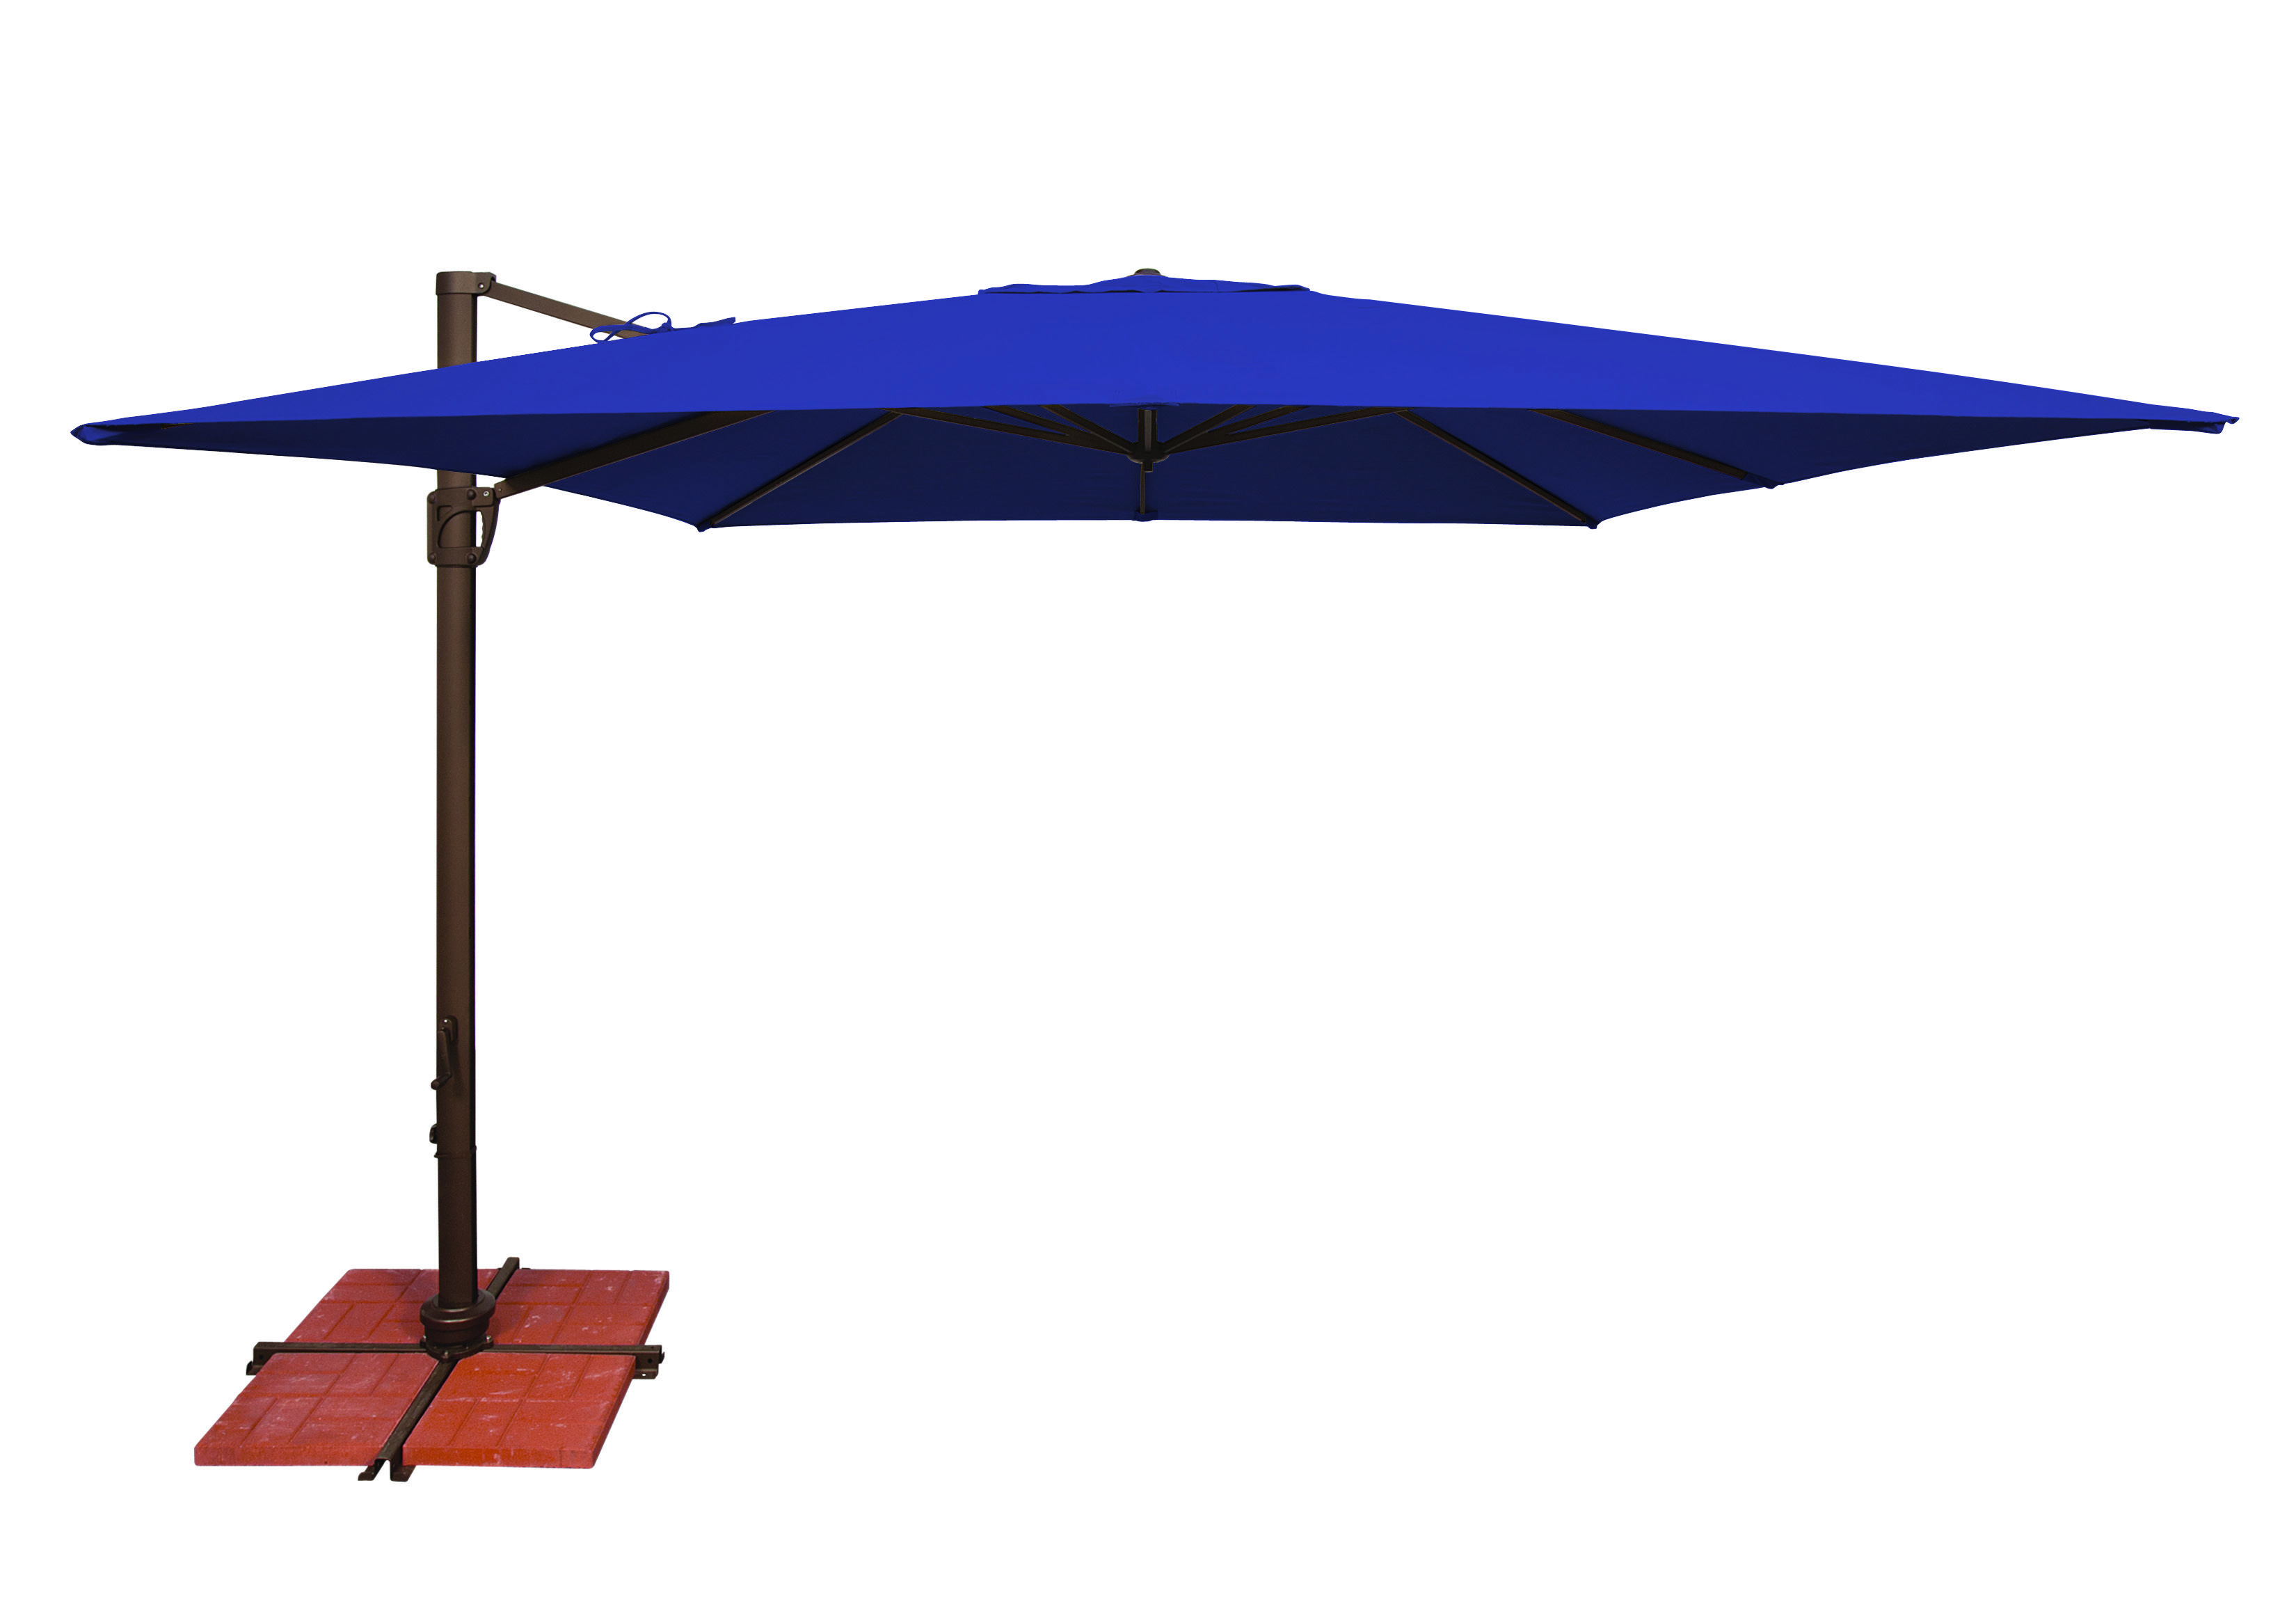 Patio Umbrellas Sale You Ll Love Wayfair With Images Market